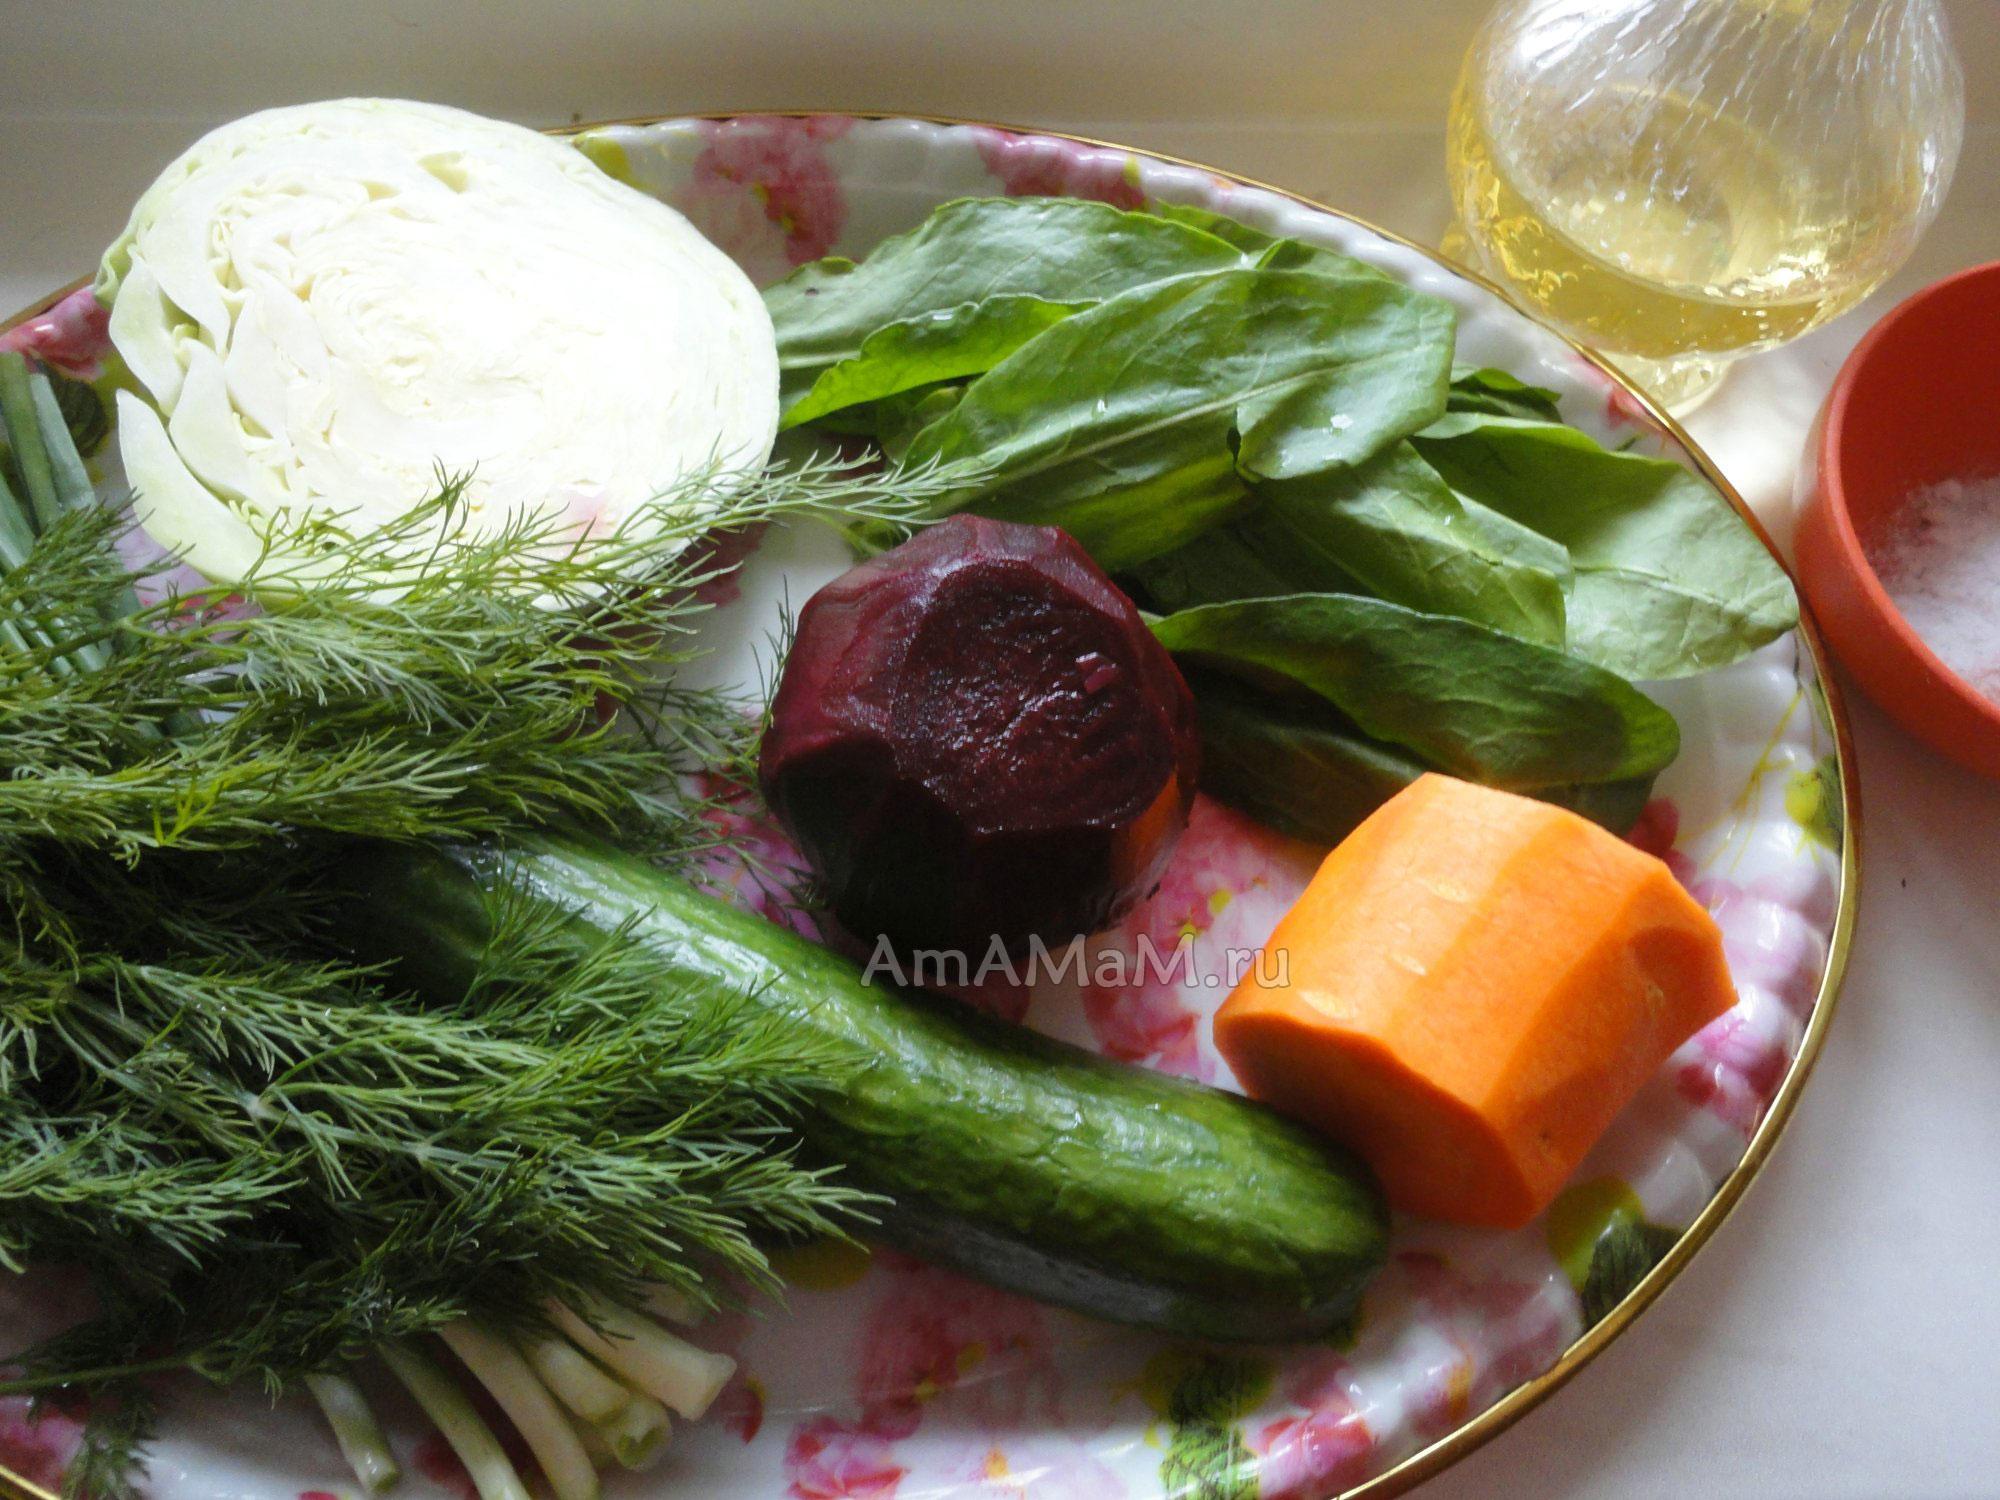 салат ветчина помидоры рецепт с фото